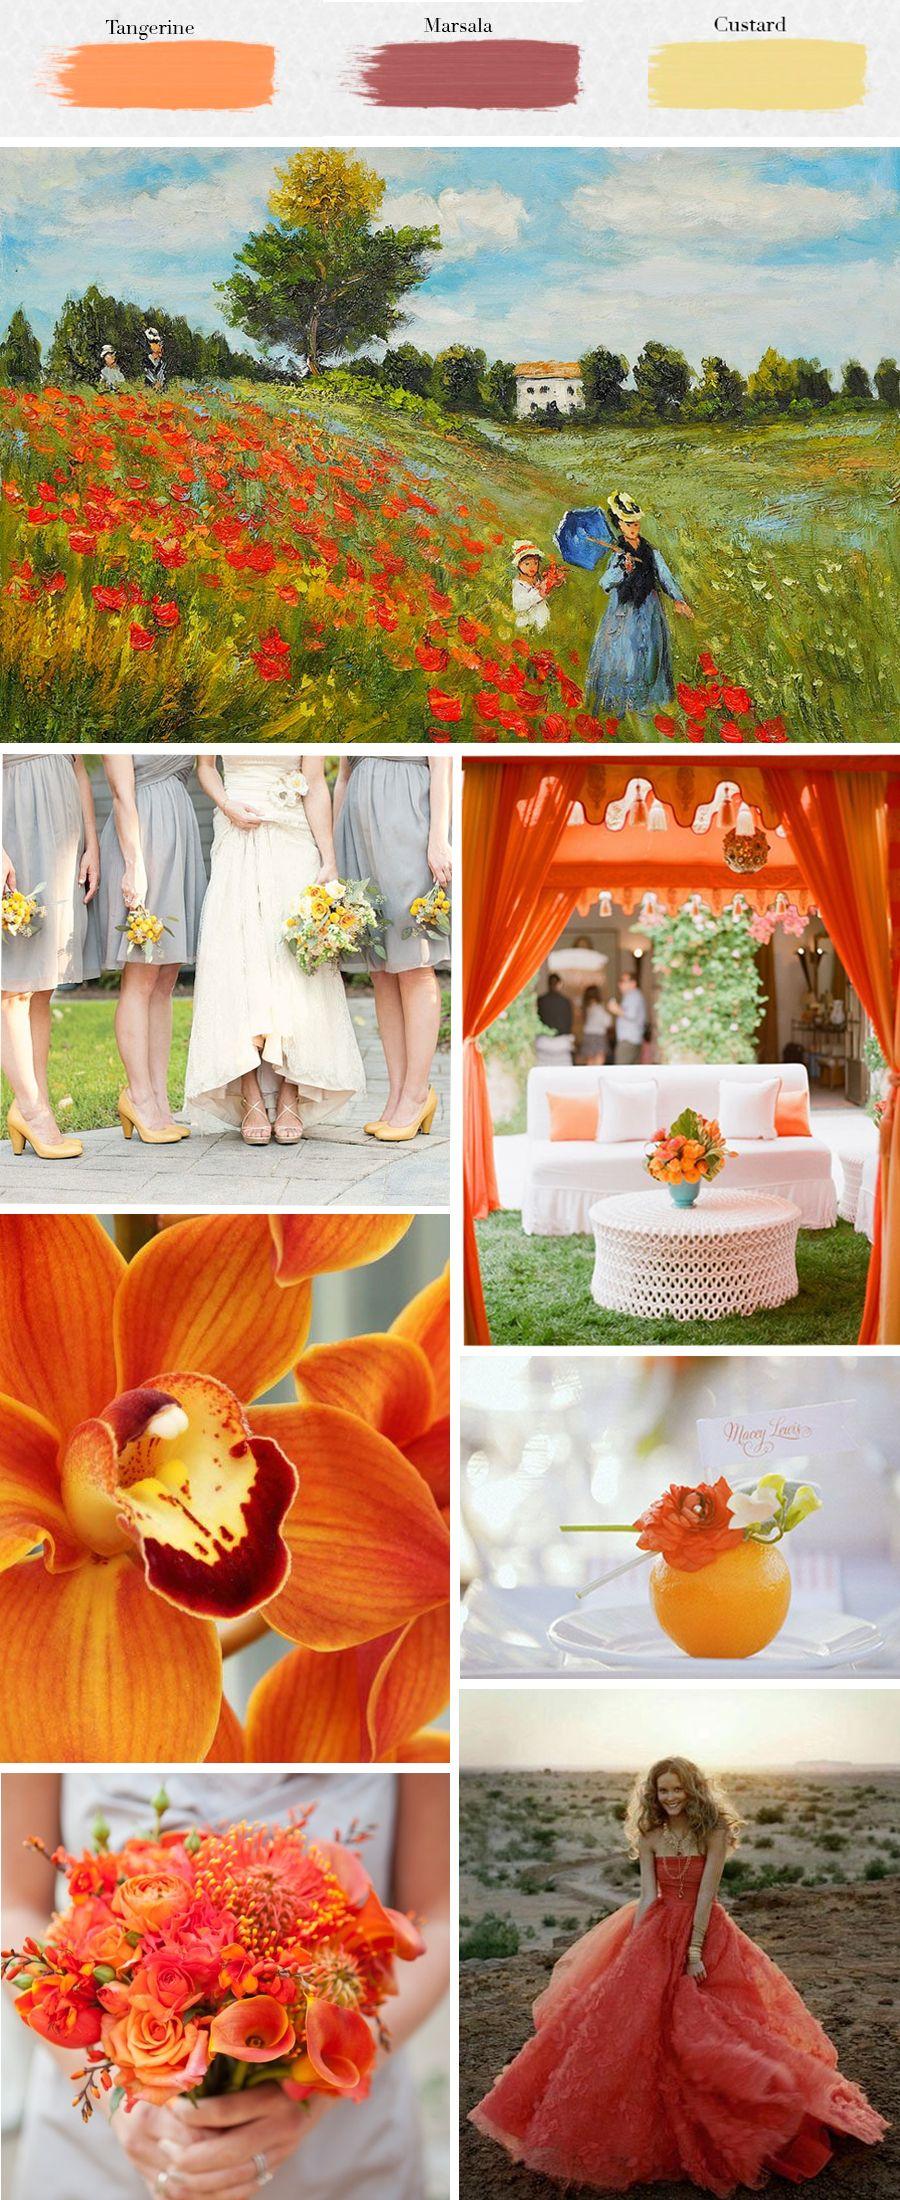 Wedding Trends 2015 Wedding Colors Wedding Color Trends Strictly Weddings